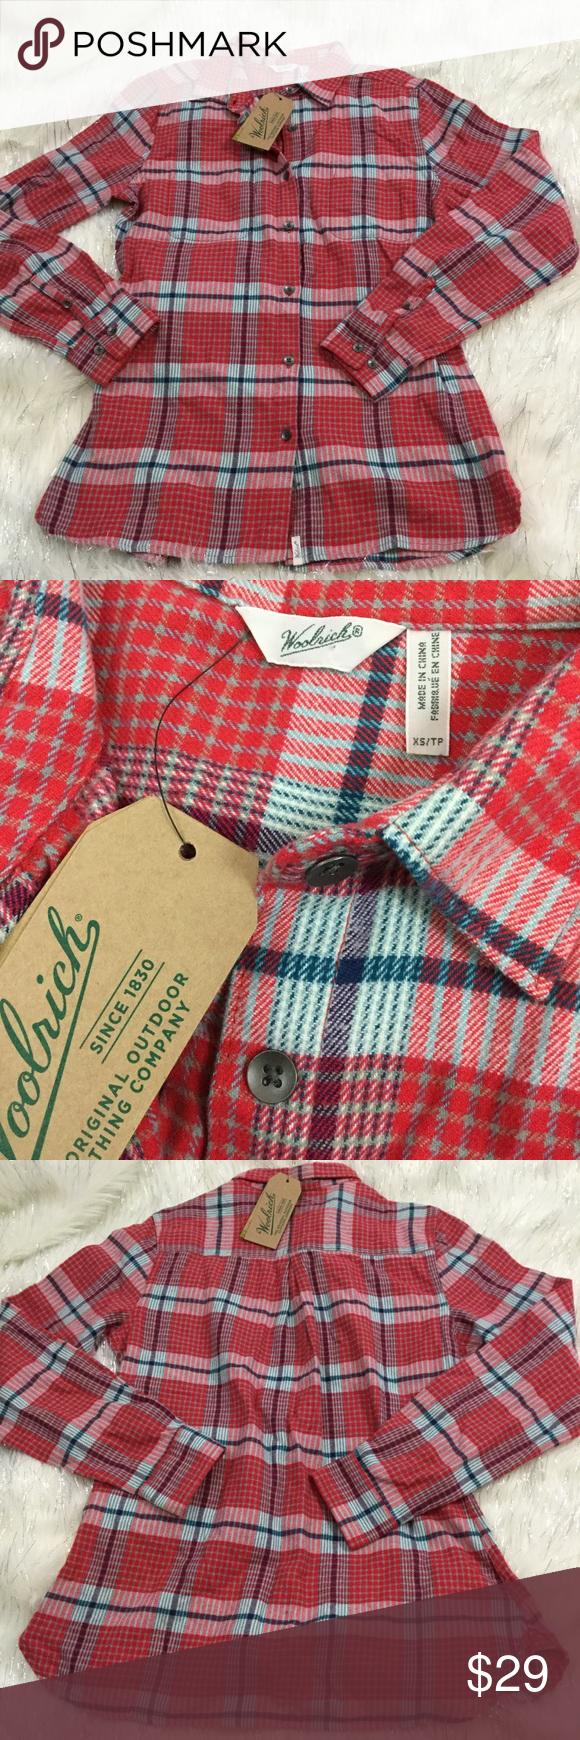 Flannel shirt xs  Woolrich plaid flannel shirt  Plaid flannel Flannel shirts and